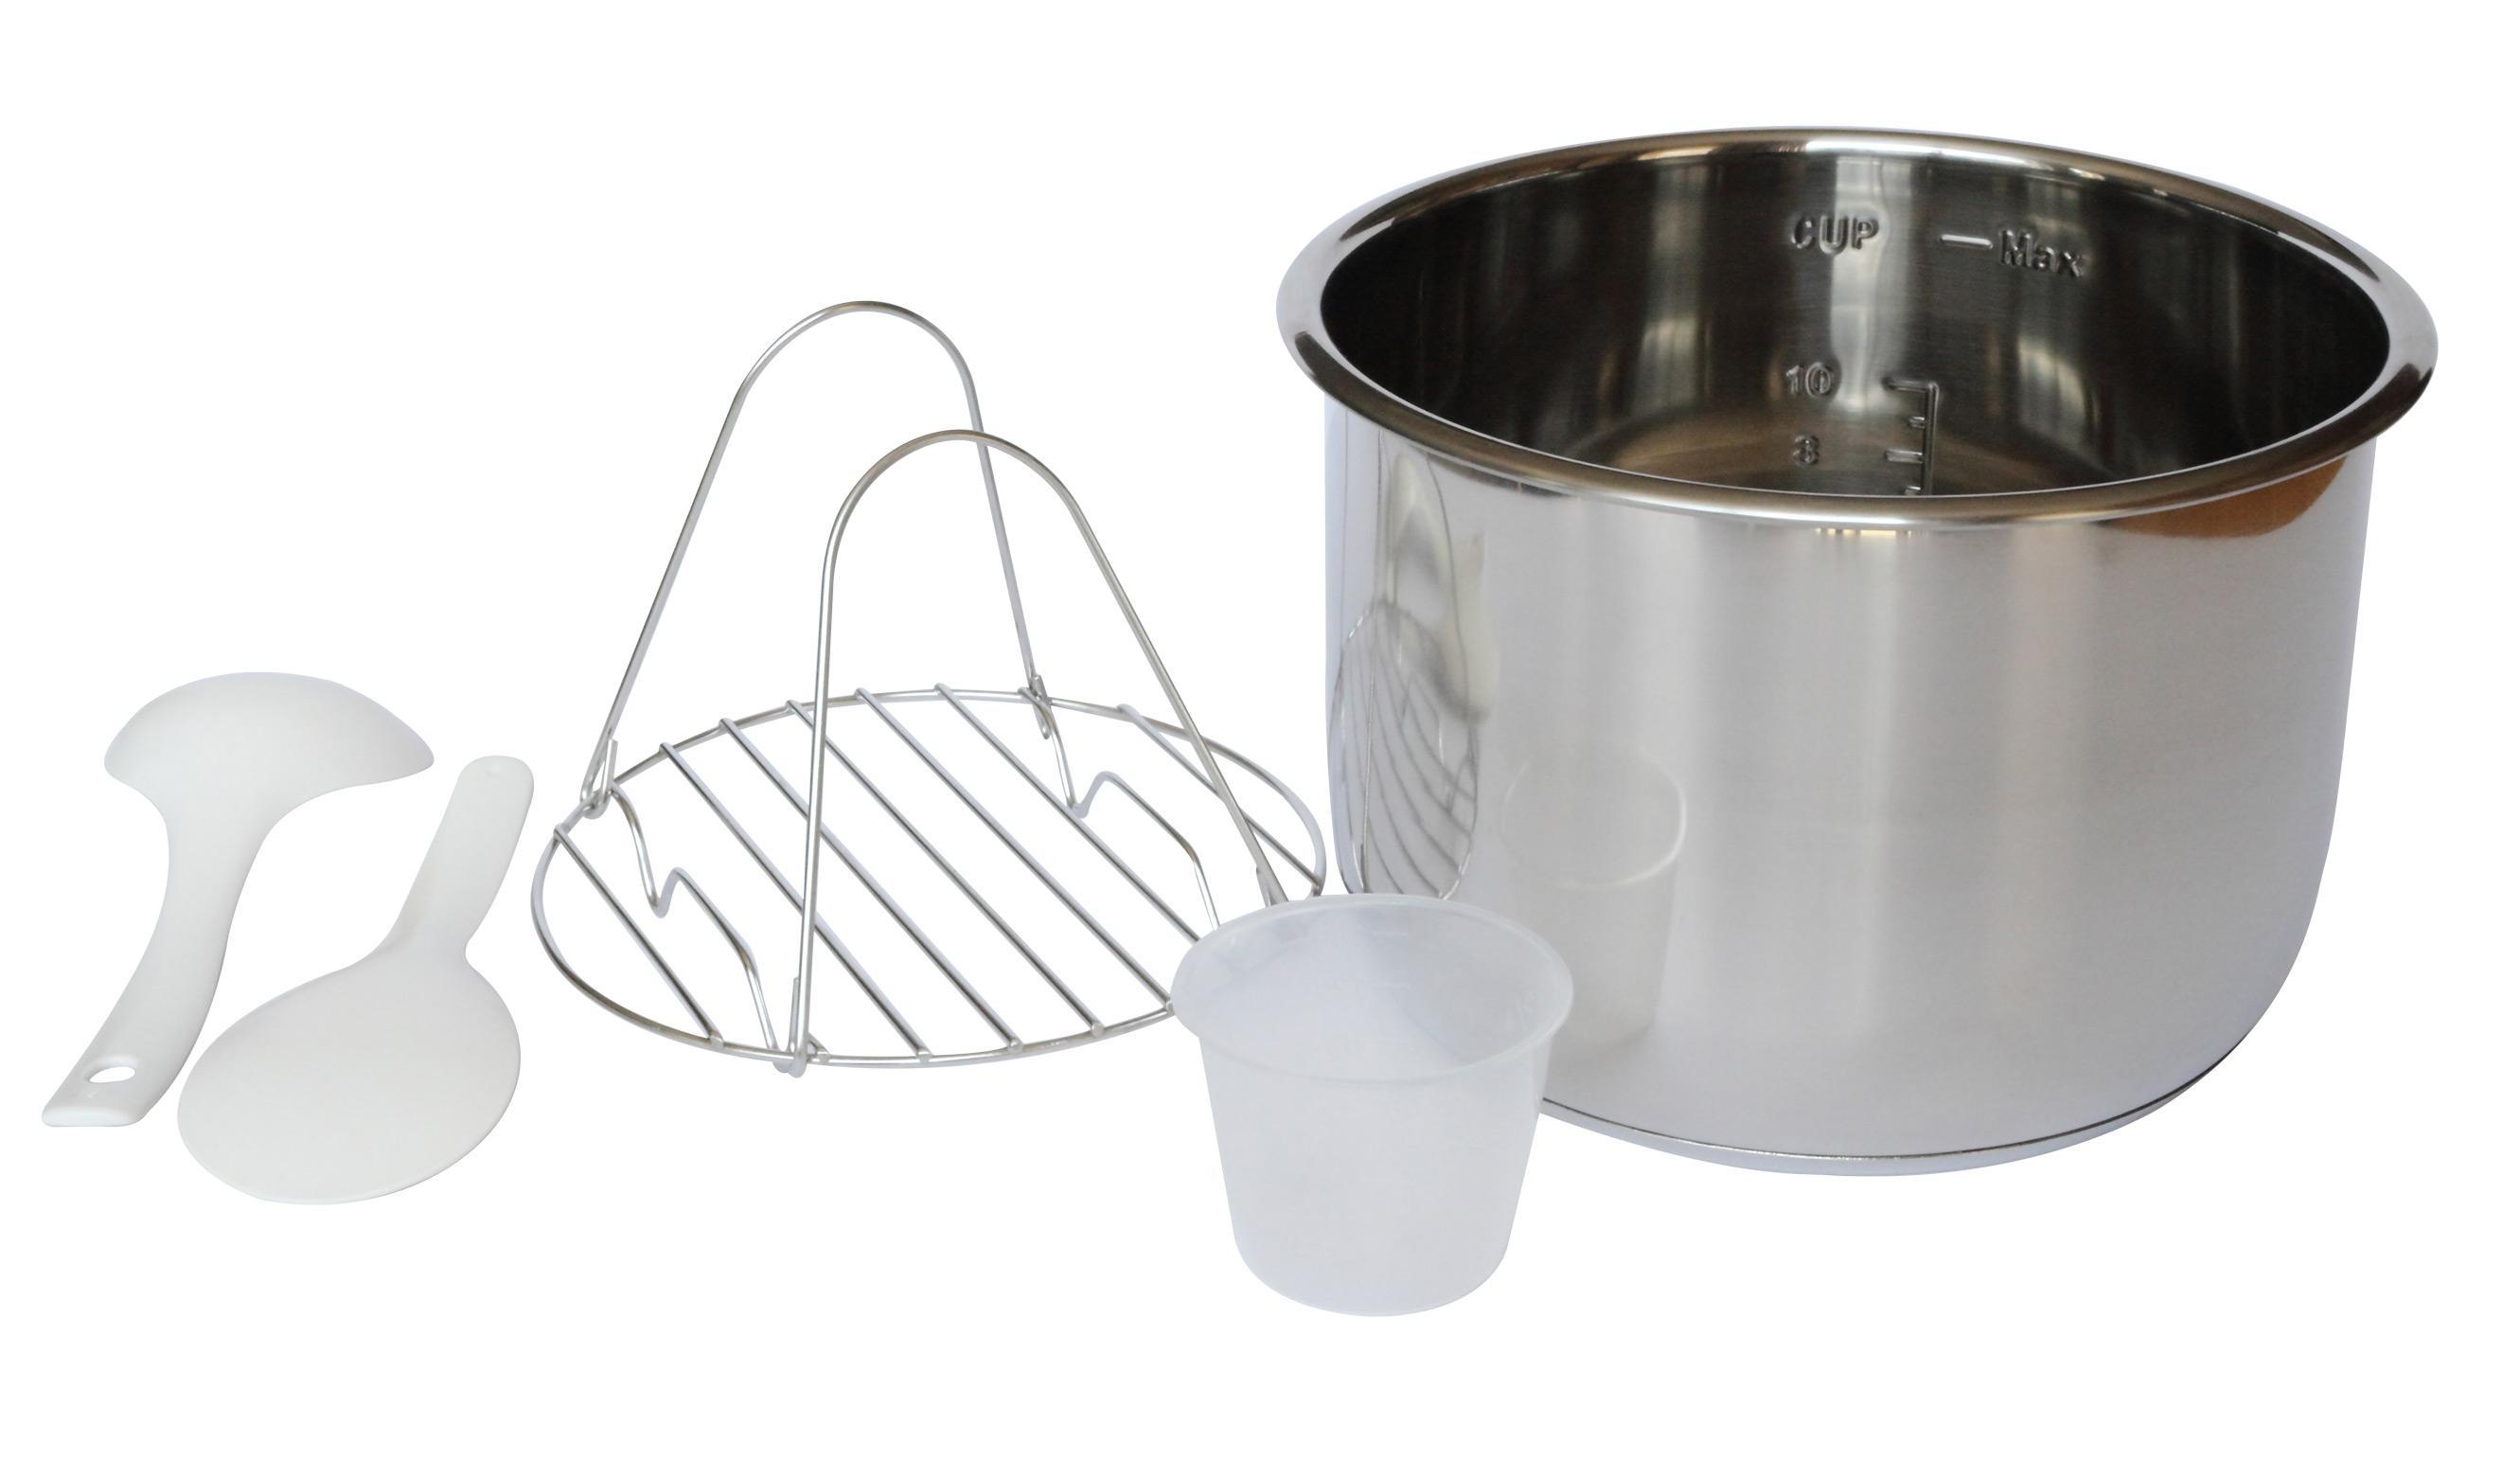 Amazon.com: Instant Pot IP-DUO60 7-in-1 Multi-Functional